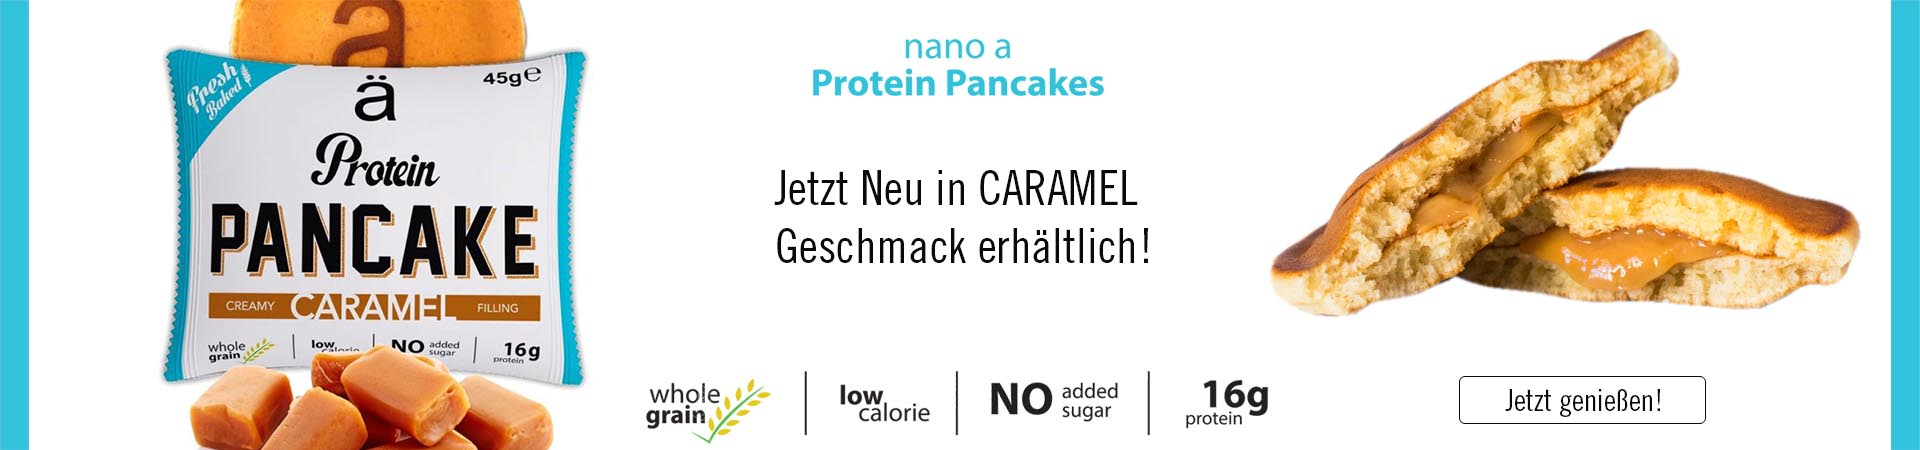 Nano ä Pancake CARAMEL